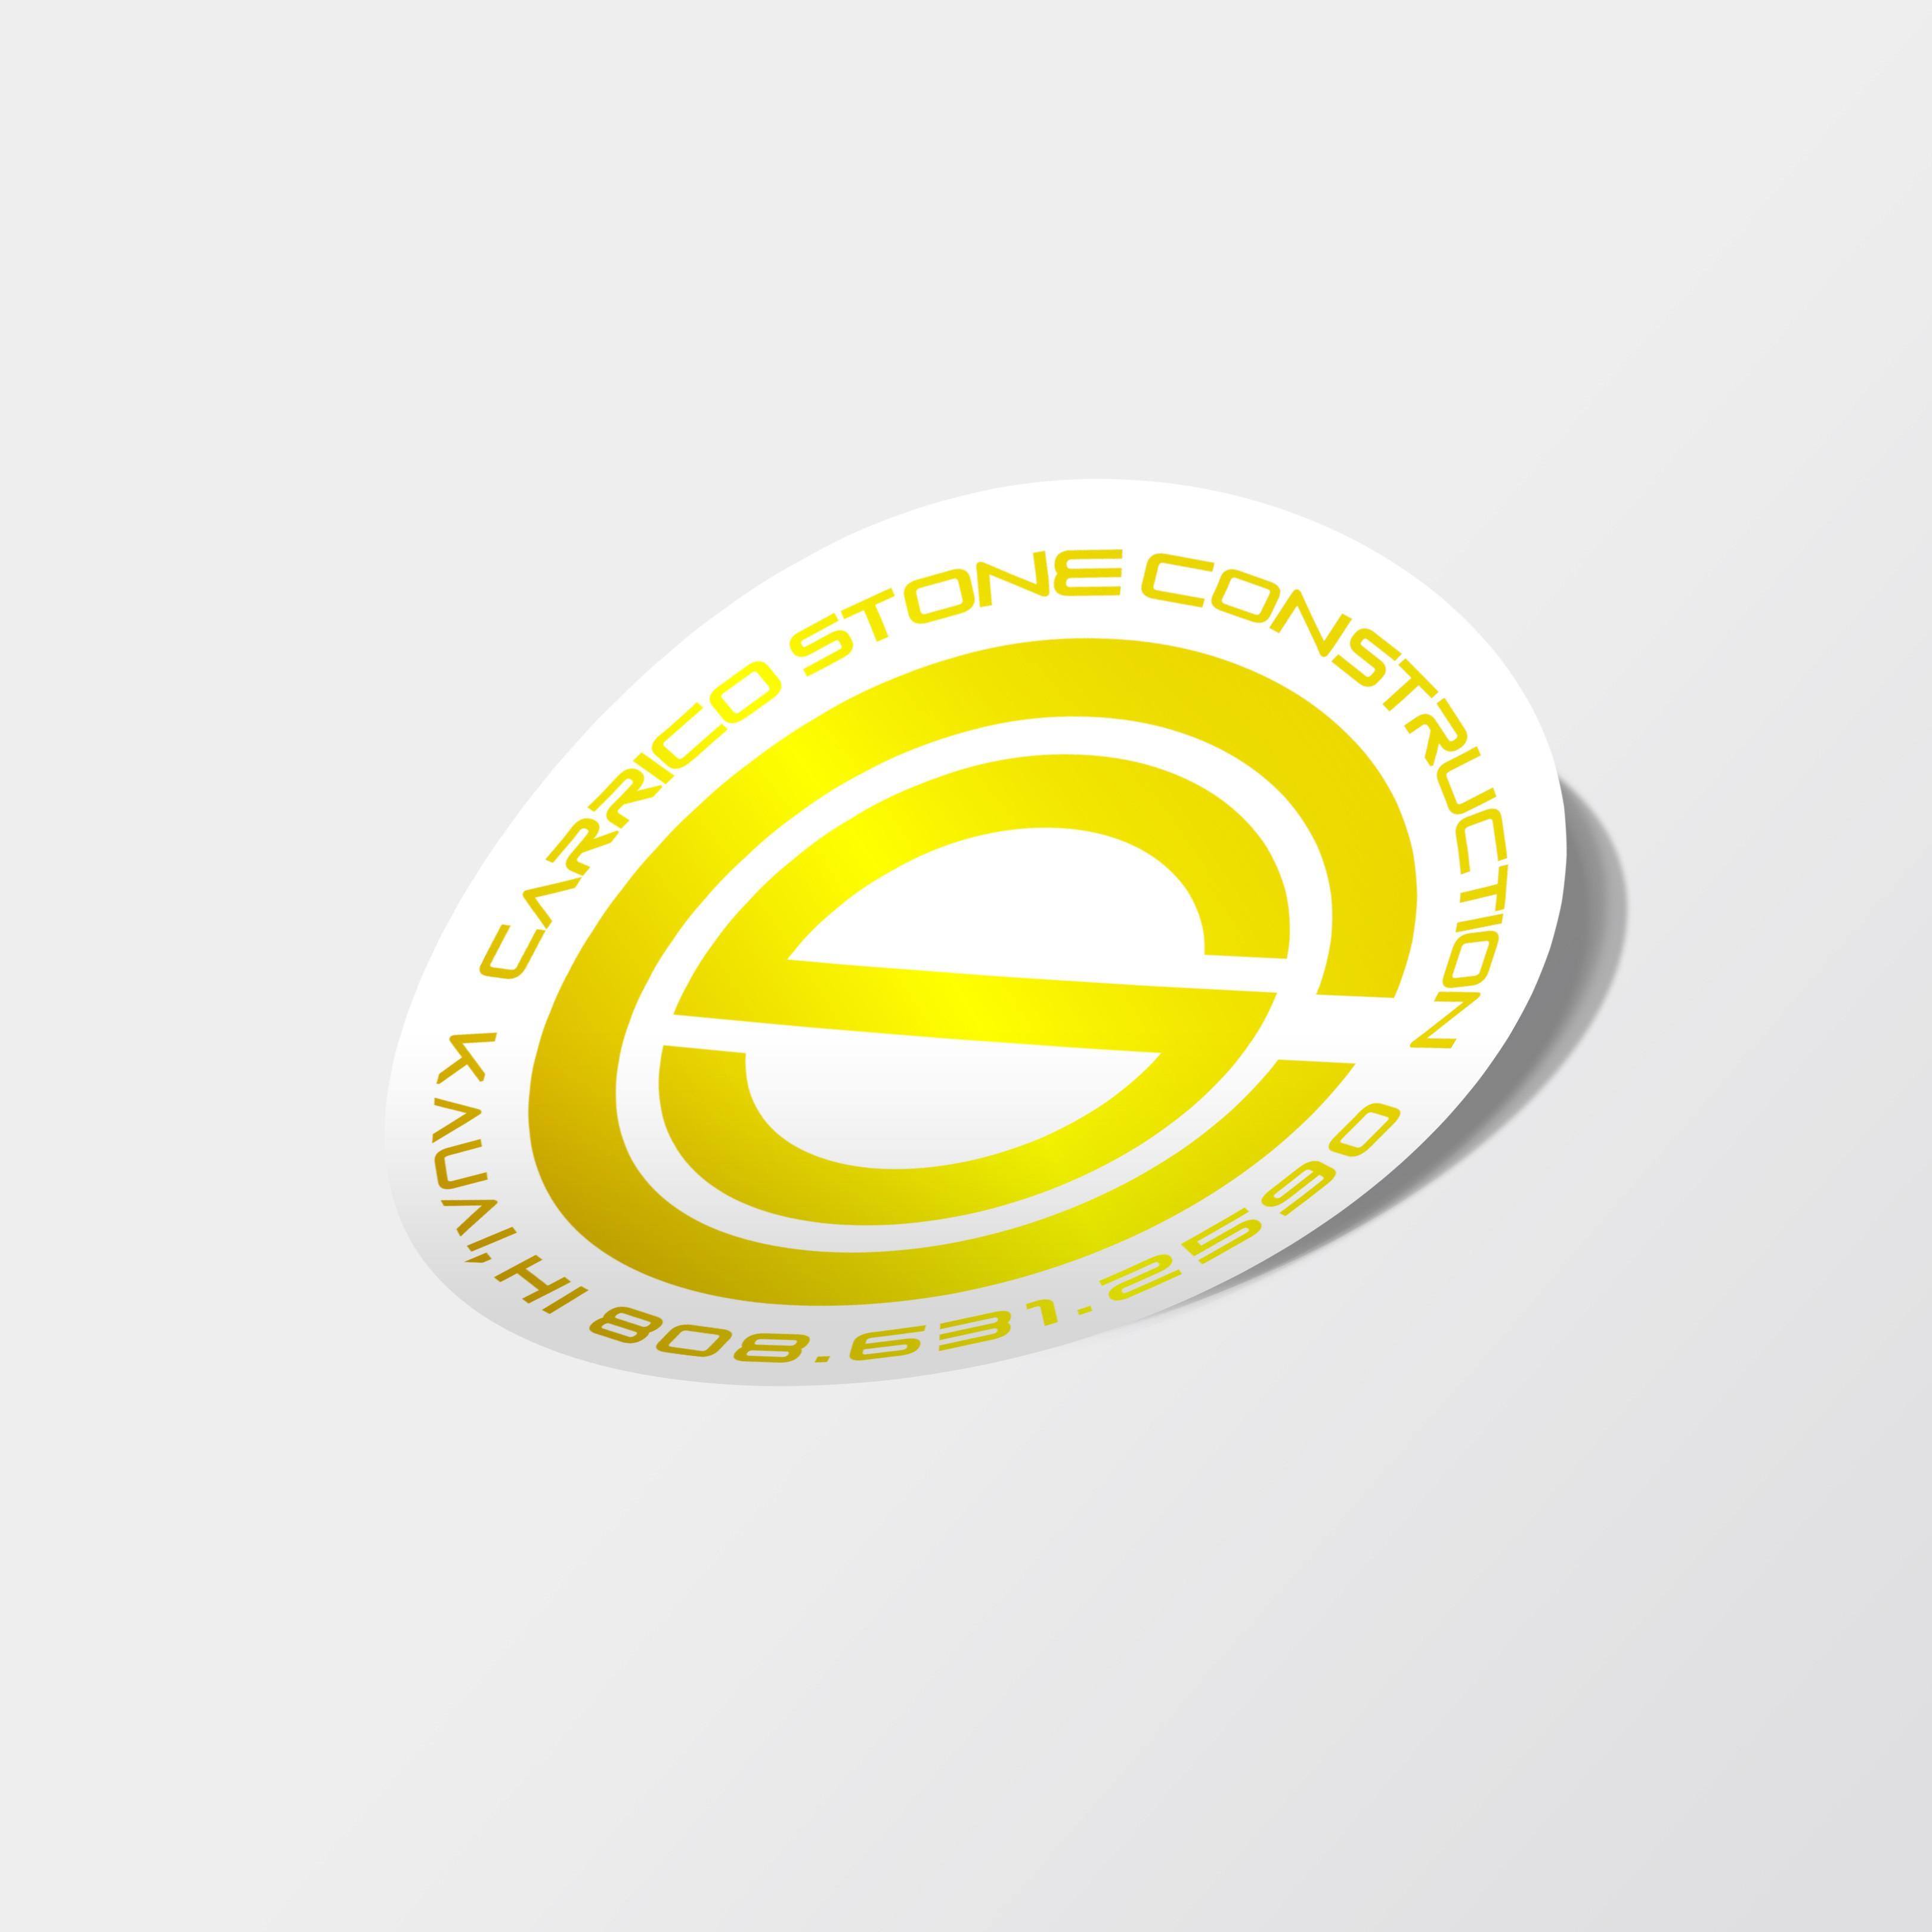 Carrico Stone Logo Update